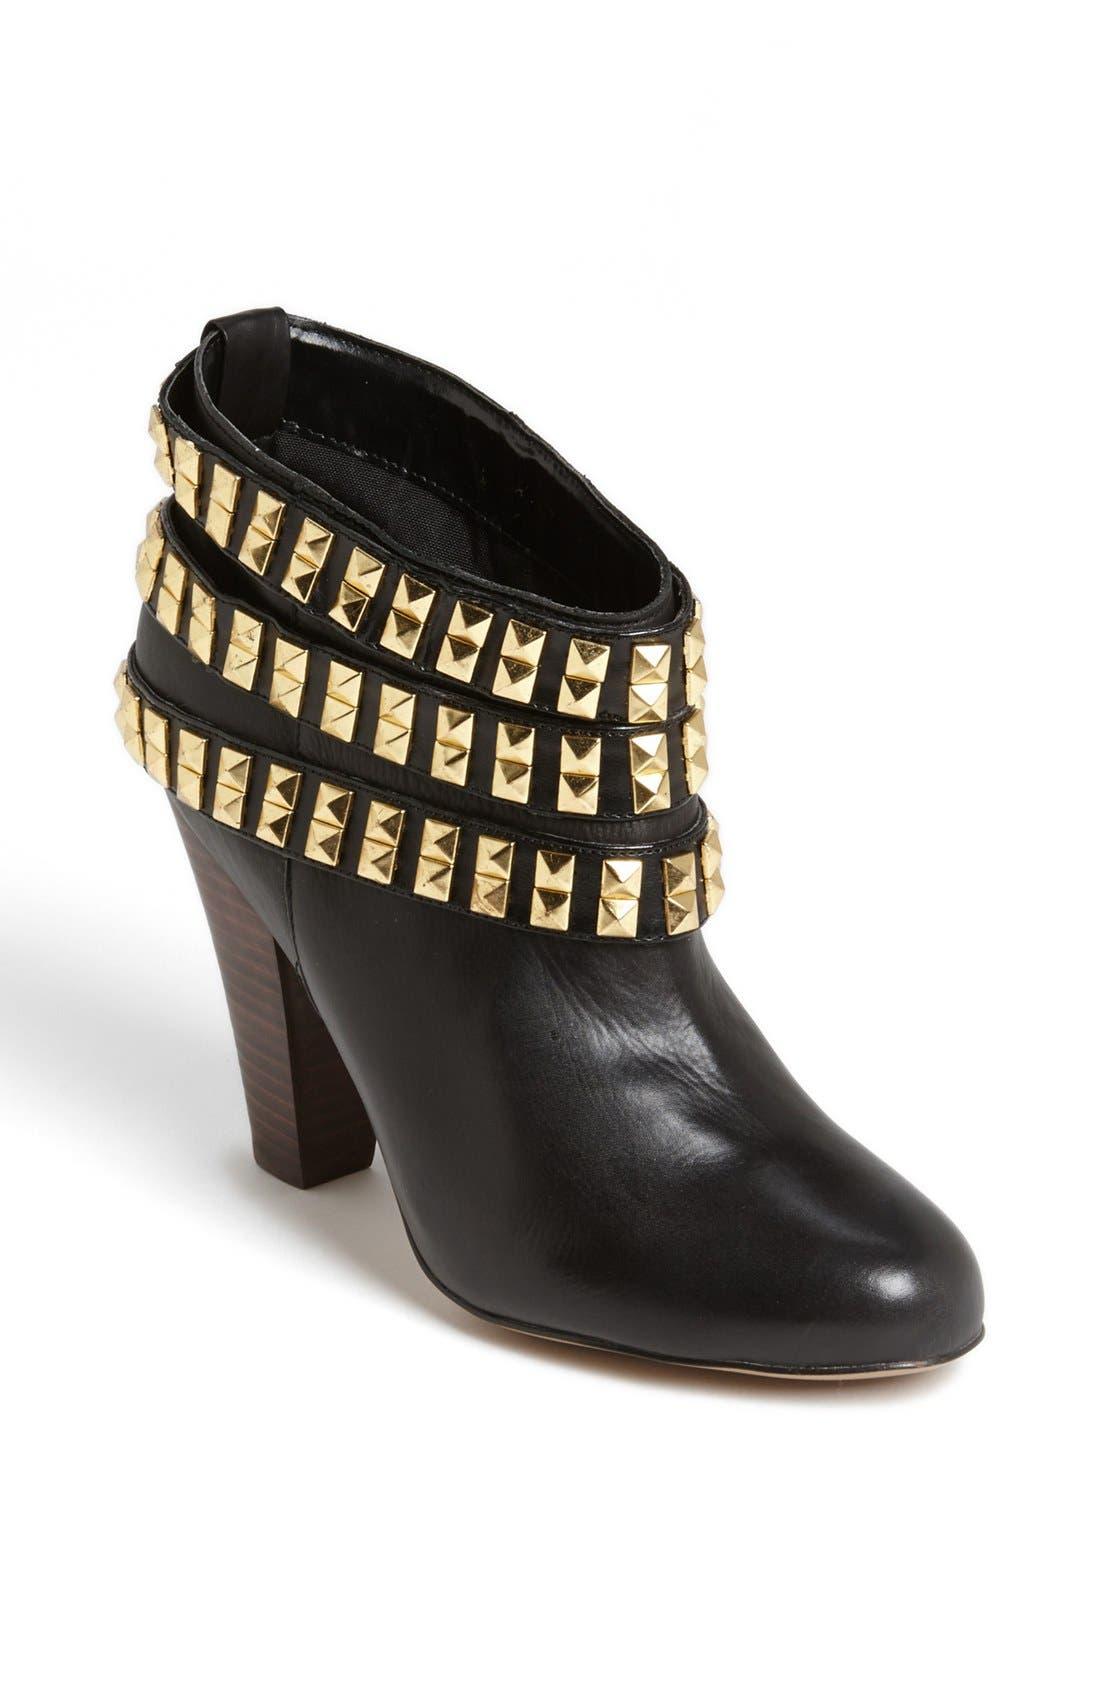 Alternate Image 1 Selected - Betsey Johnson 'Concertt' Boot